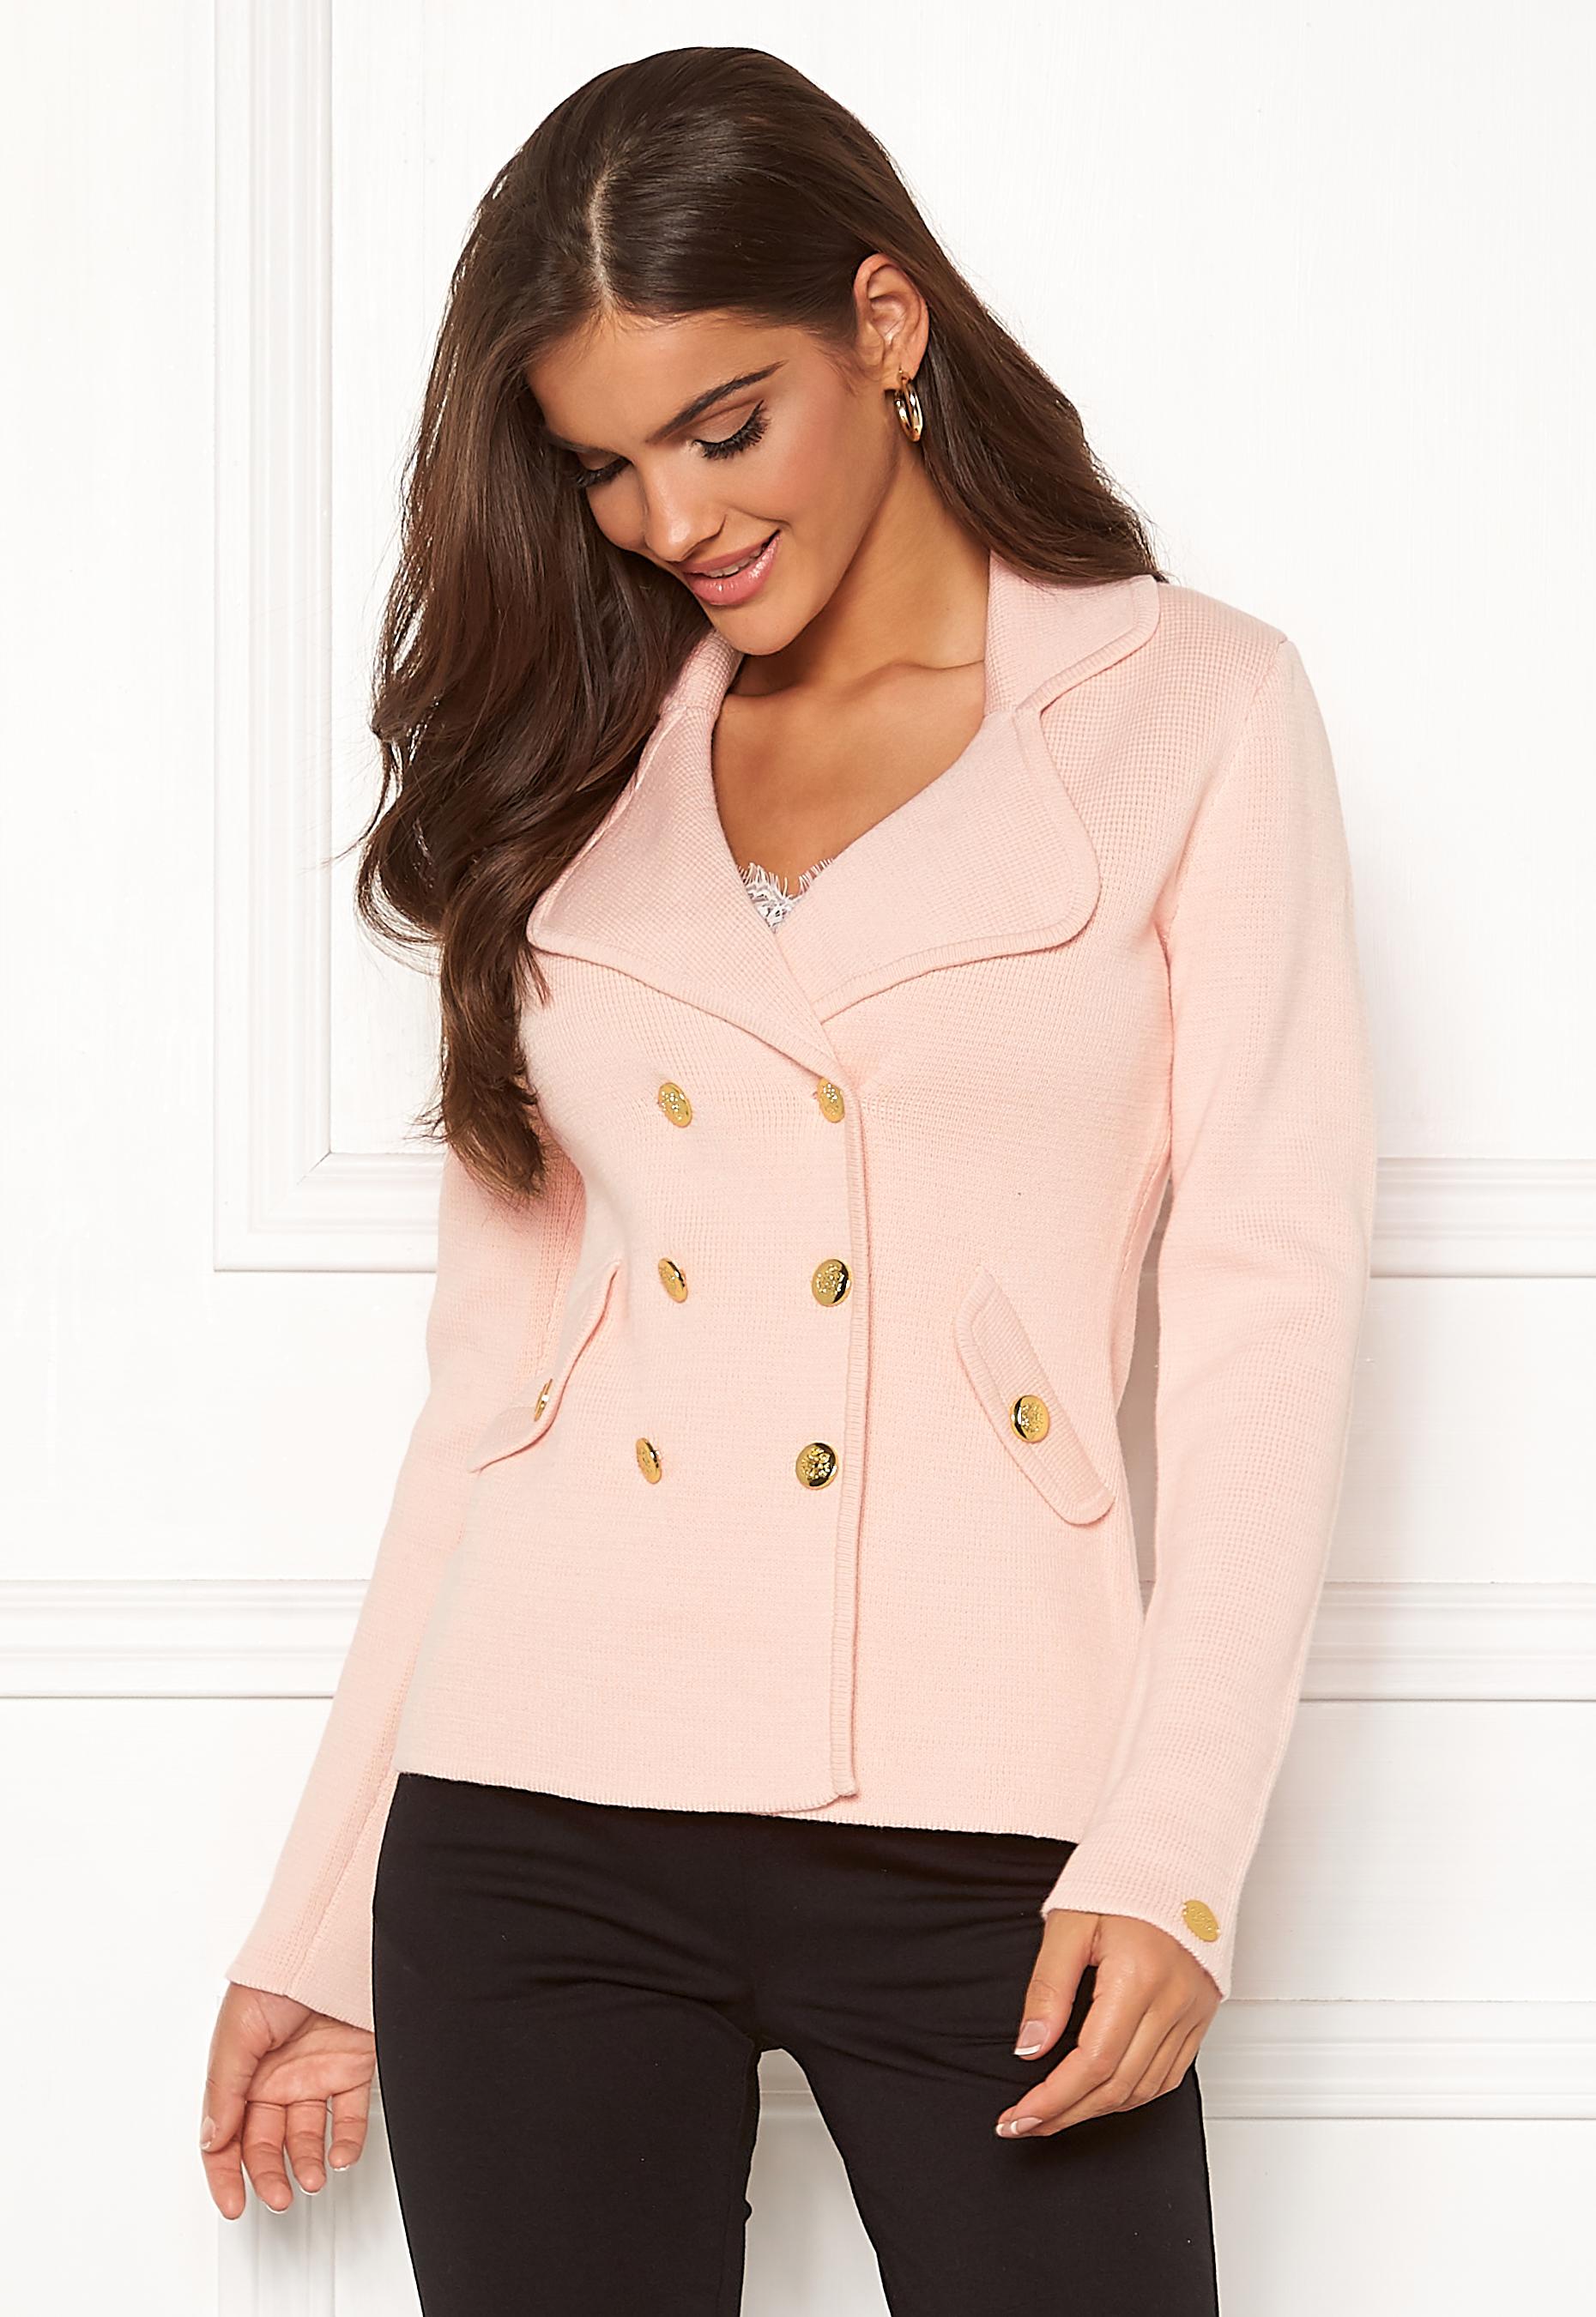 908b6b7a97a Chiara Forthi Chiara Heavy Knit Blazer Light pink - Bubbleroom